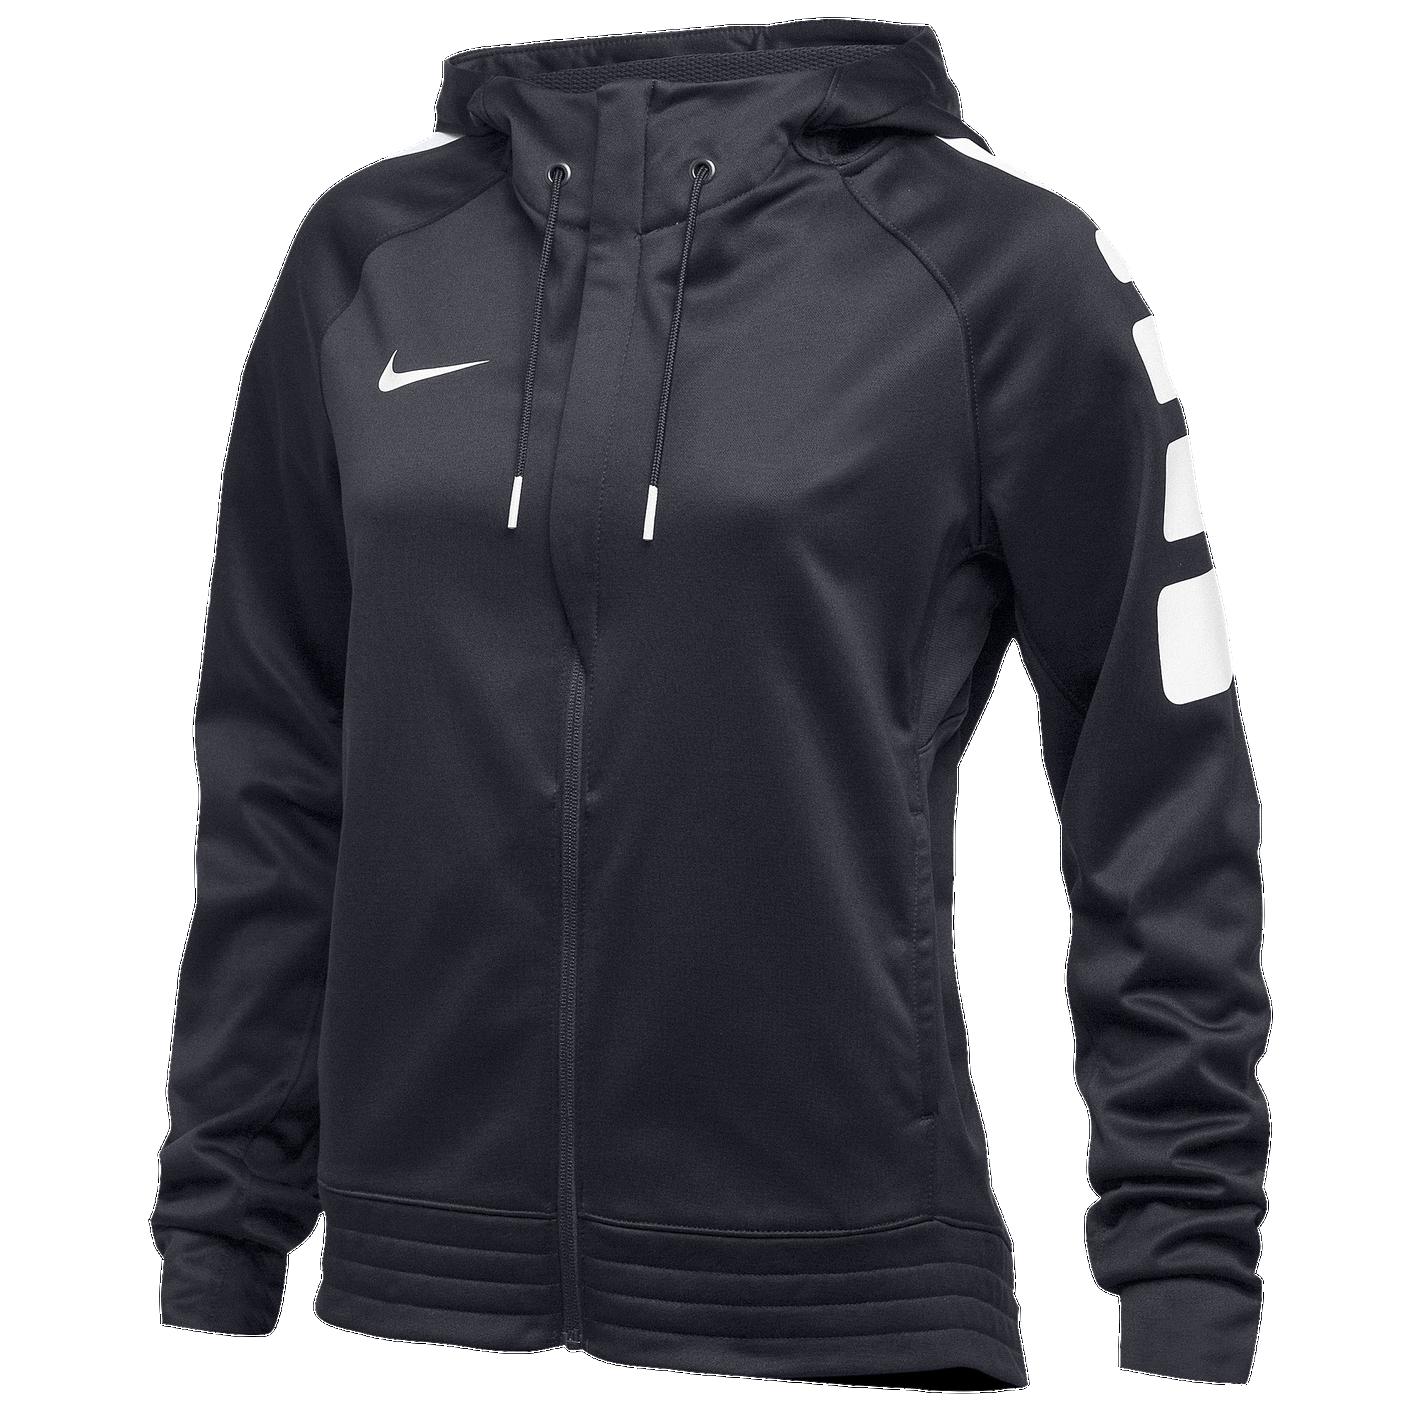 Nike Team Elite Stripe Hoodie - Women s - For All Sports - Clothing ... 1c15b12ff1